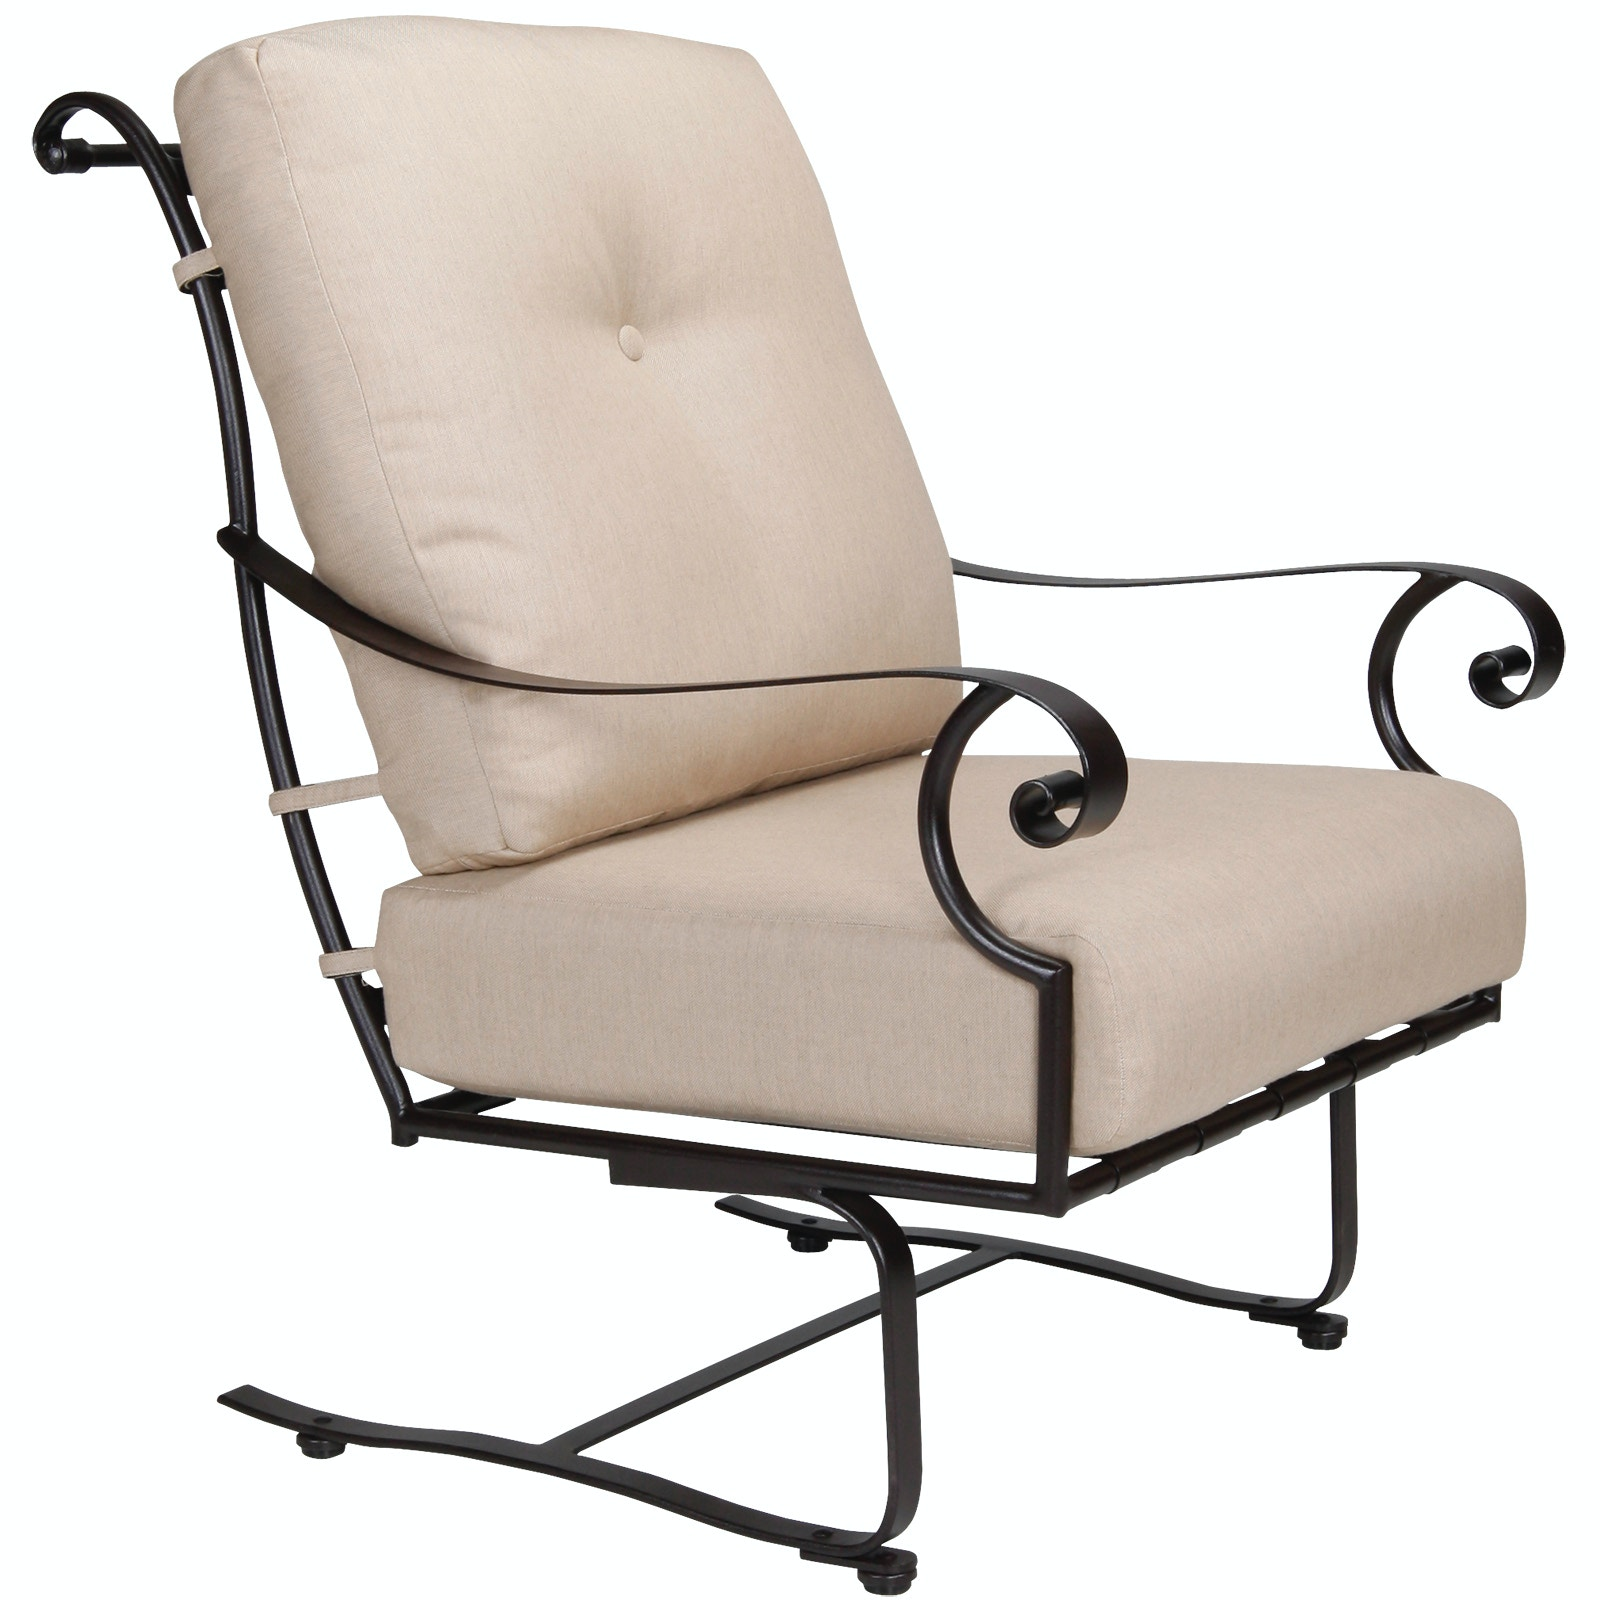 OW Lee Furniture St. Charles Spring Base Lounge Chair Owlee Furniture  26125 SB